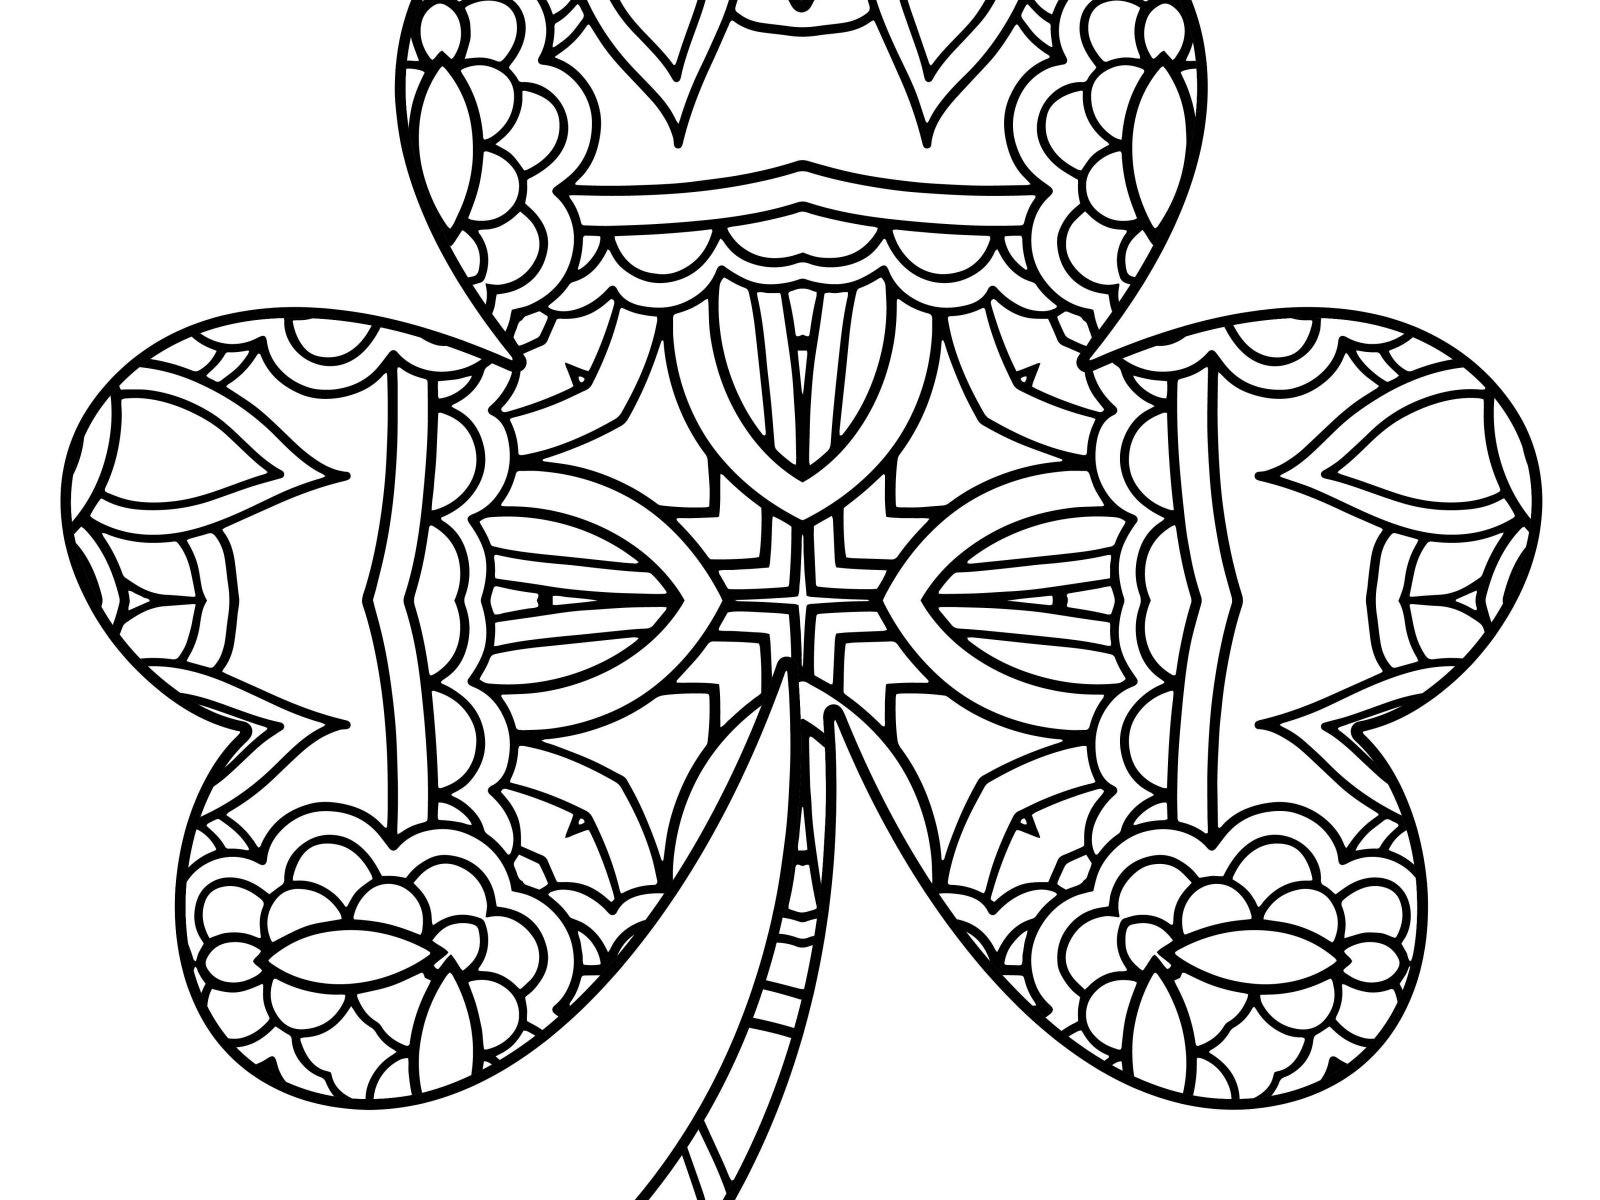 1600x1200 Shamrock Coloring Page Elegant Printable Shamrock Color Pages Free